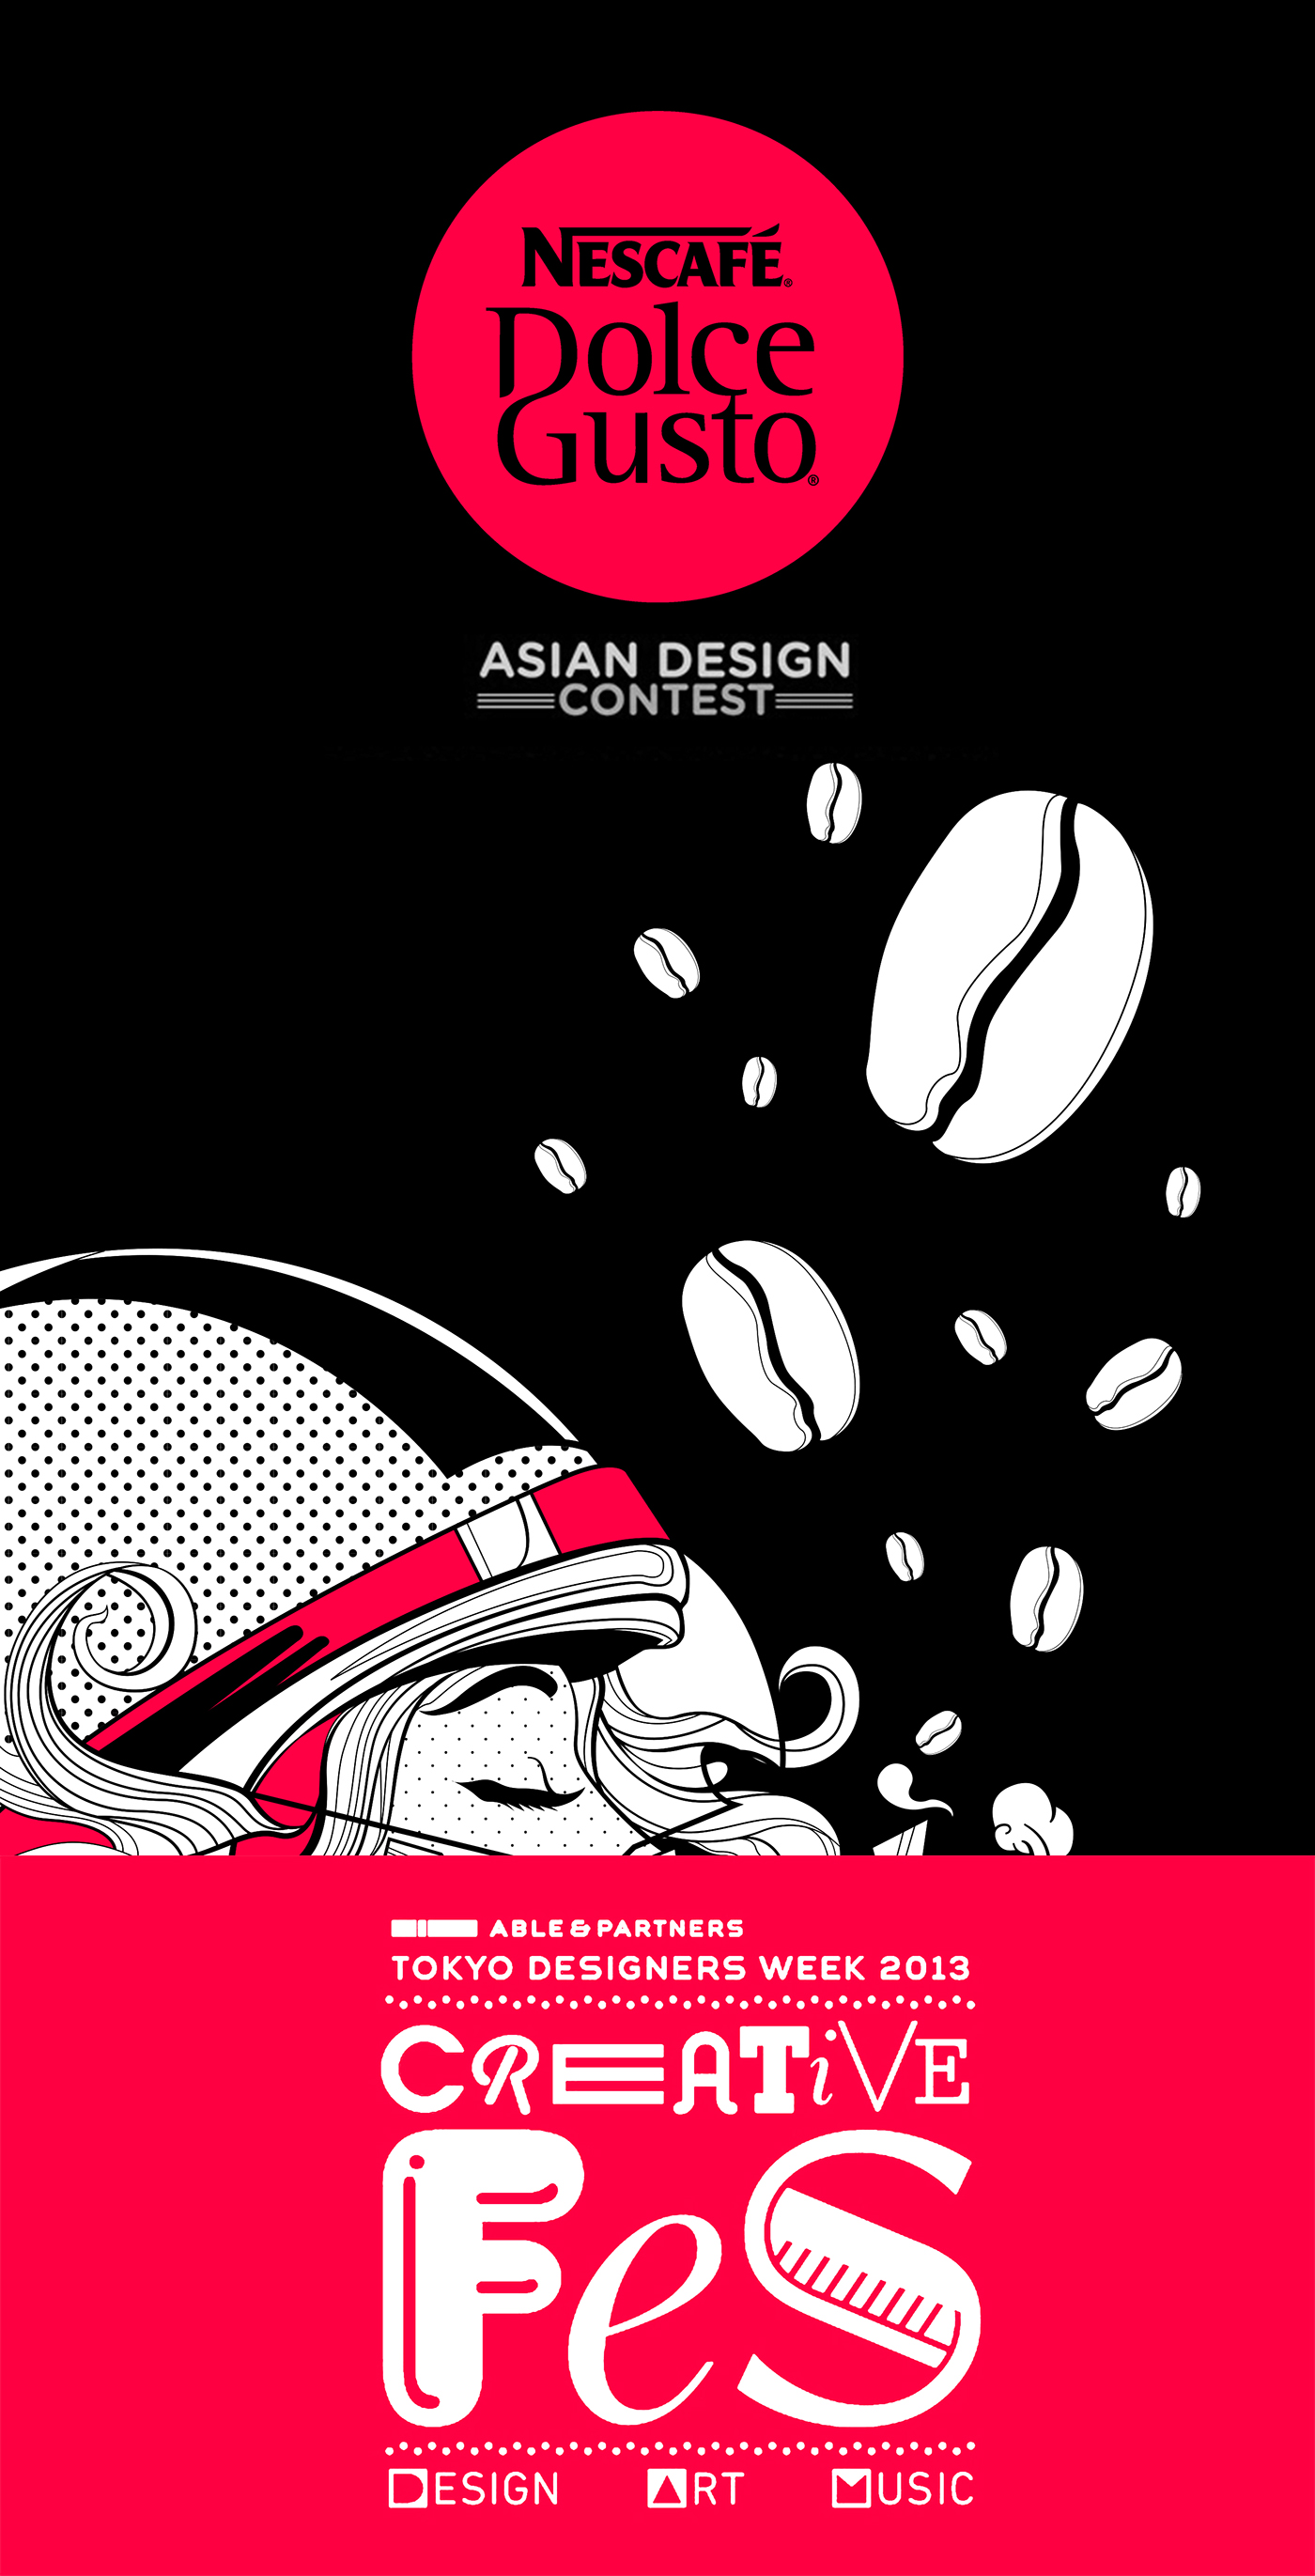 nescafe NescafePhilippines DolceGusto   ph Coffee TokyoDesignersWeek2013 TokyoJapan artph dolce astronaut Space